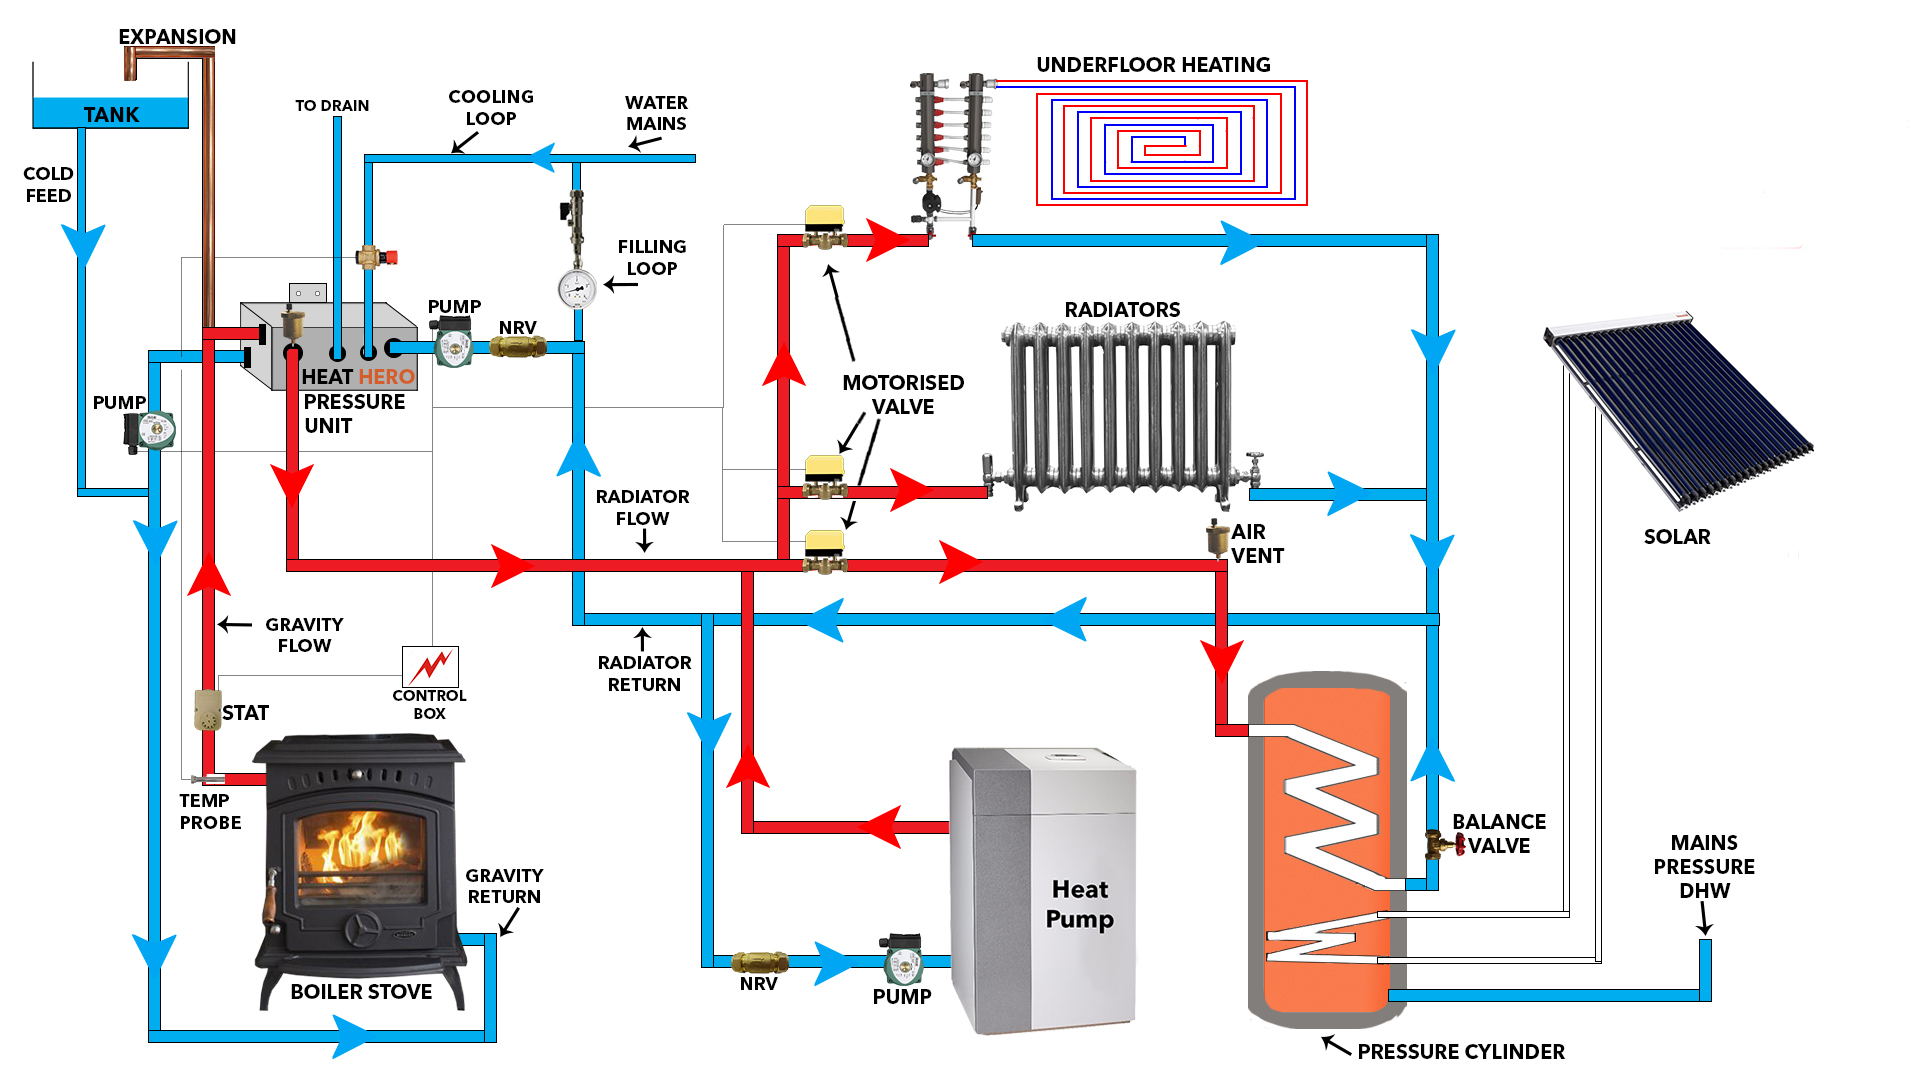 Heat Hero High Pressure Unit